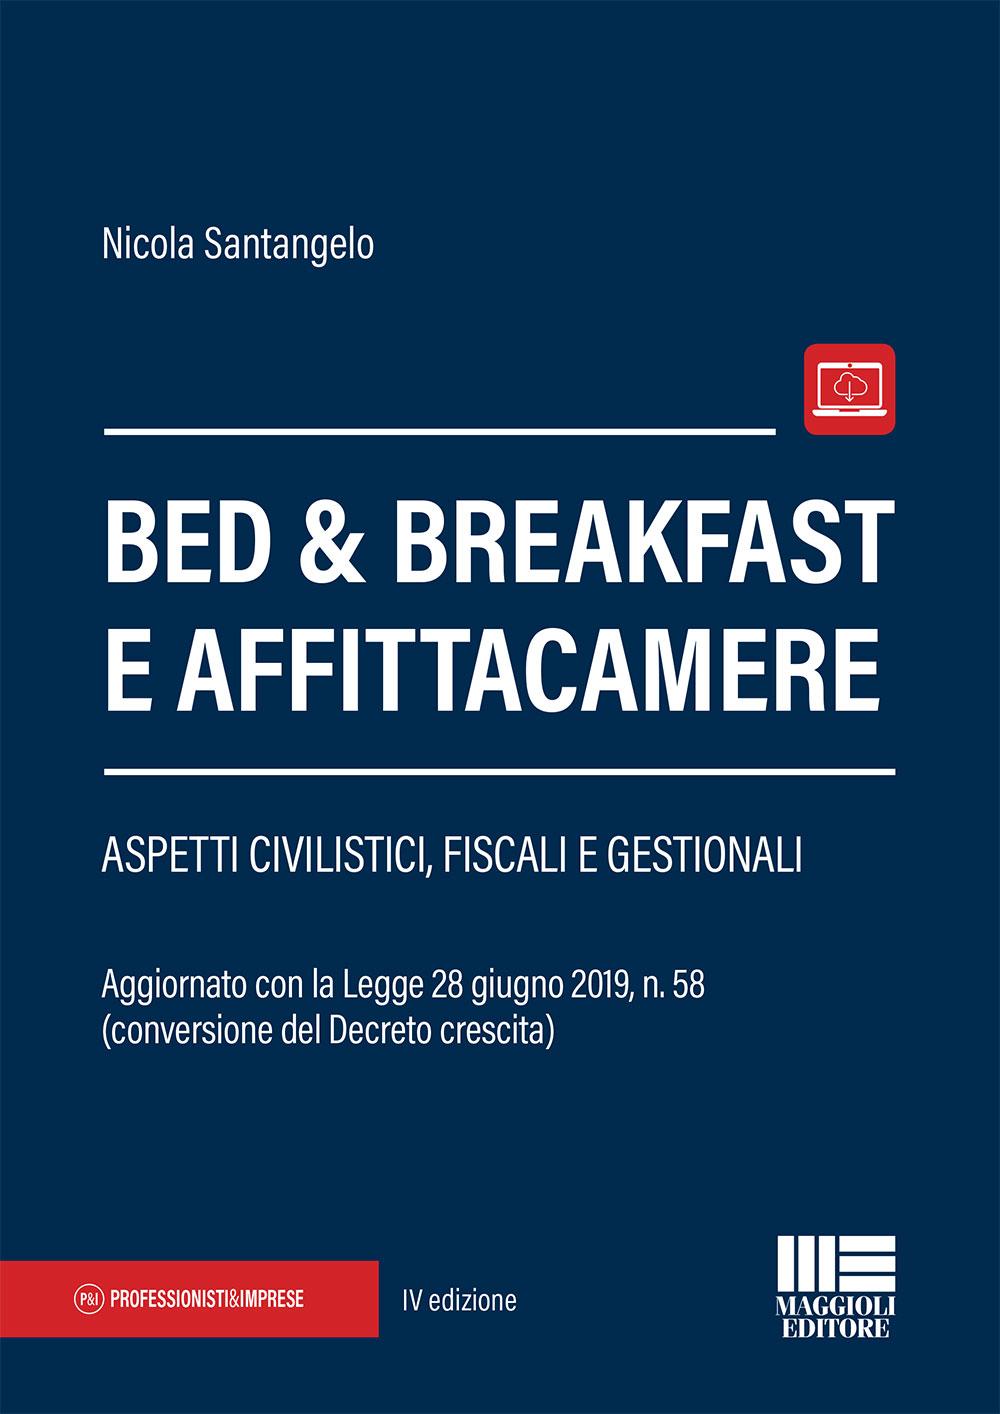 Bed & Breakfast e affittacamere - Libro carta